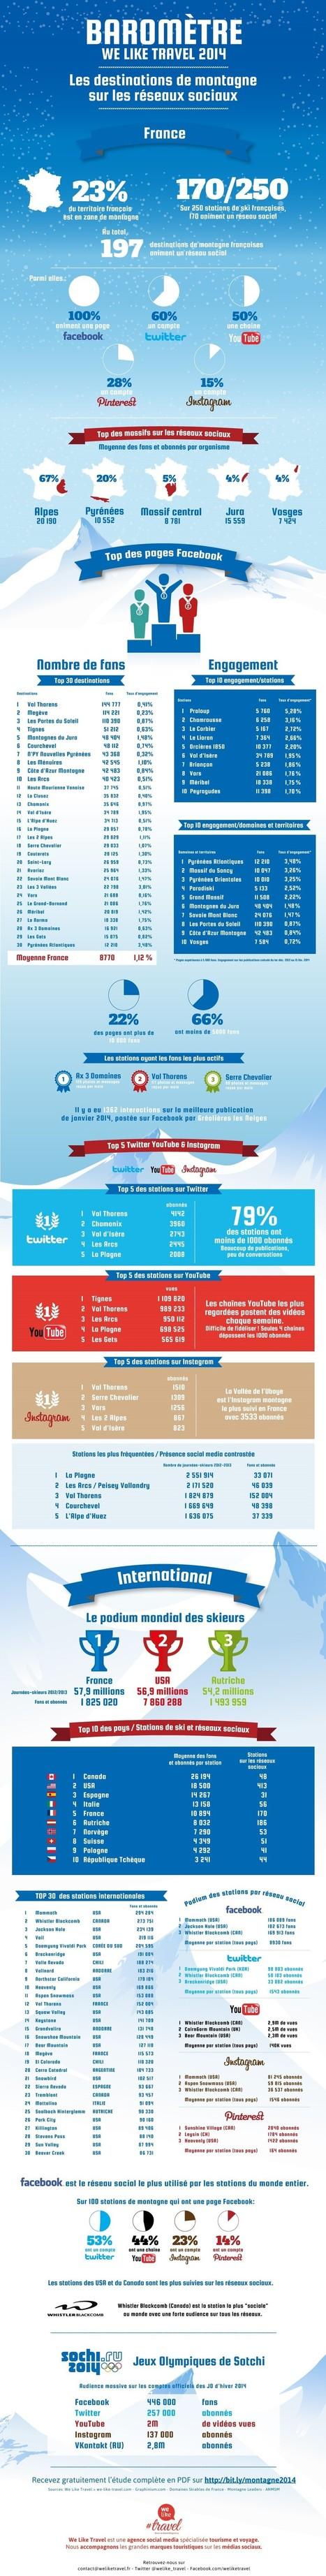 Étude Social Media Ski Montagne 2014 - We Like Travel | Les domaines skiables | Scoop.it